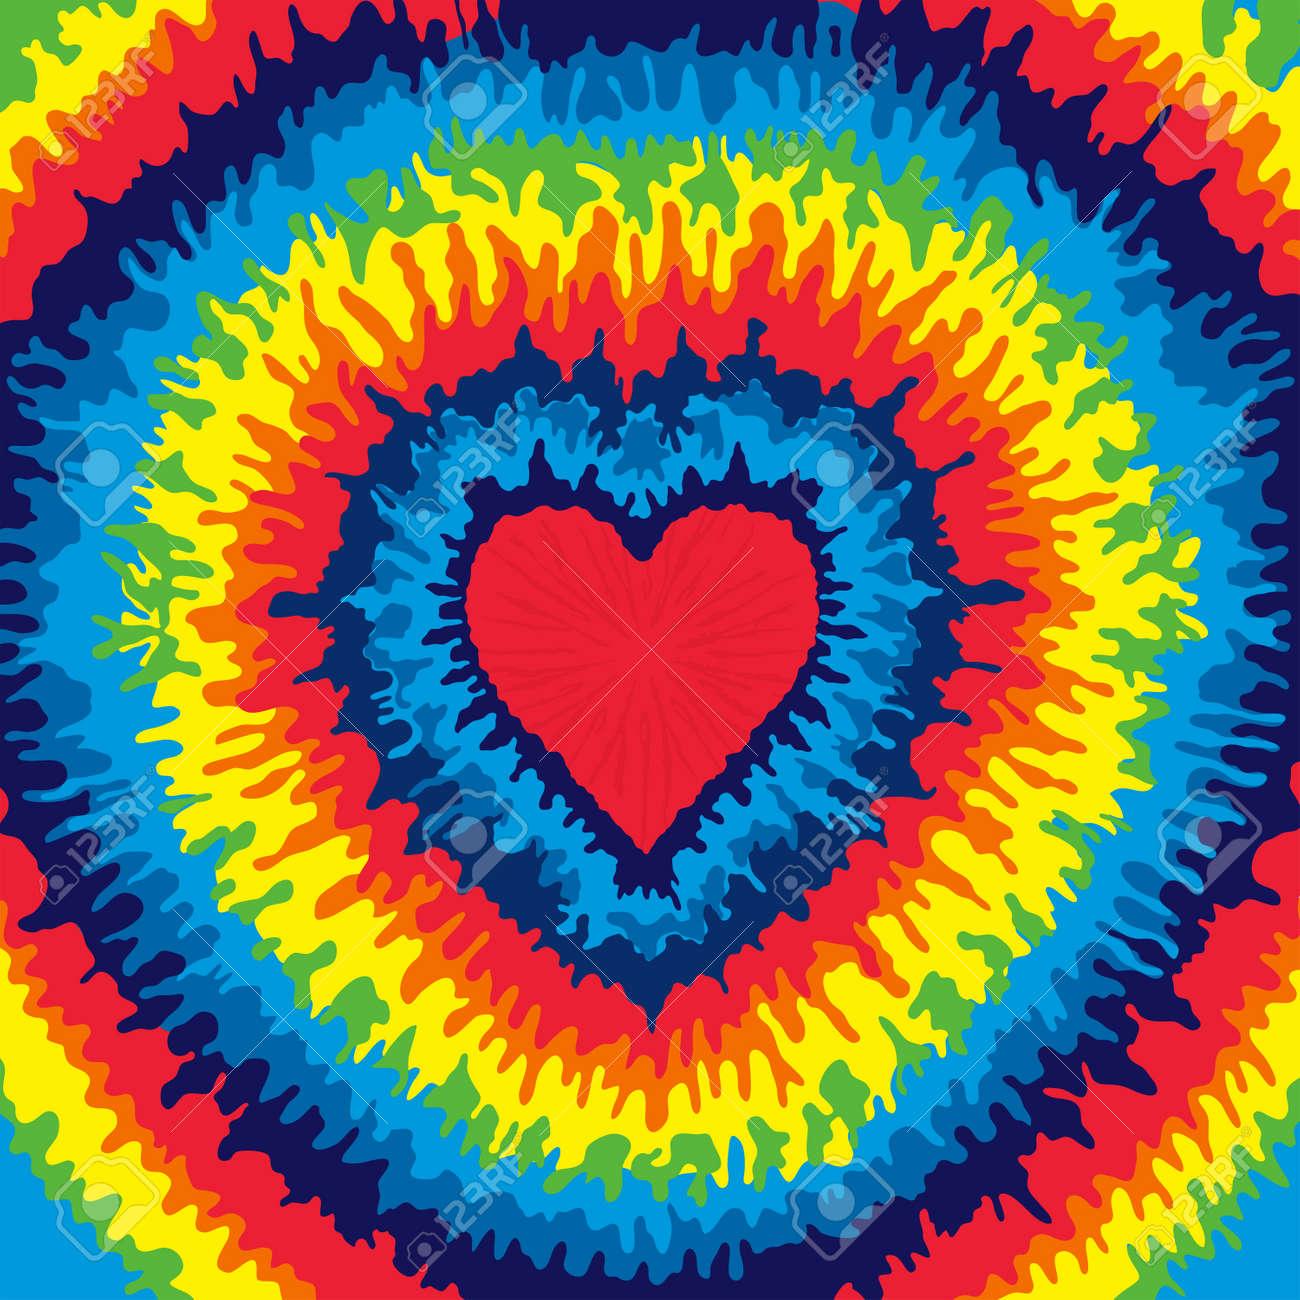 f5b6a6c1acf1 Heart